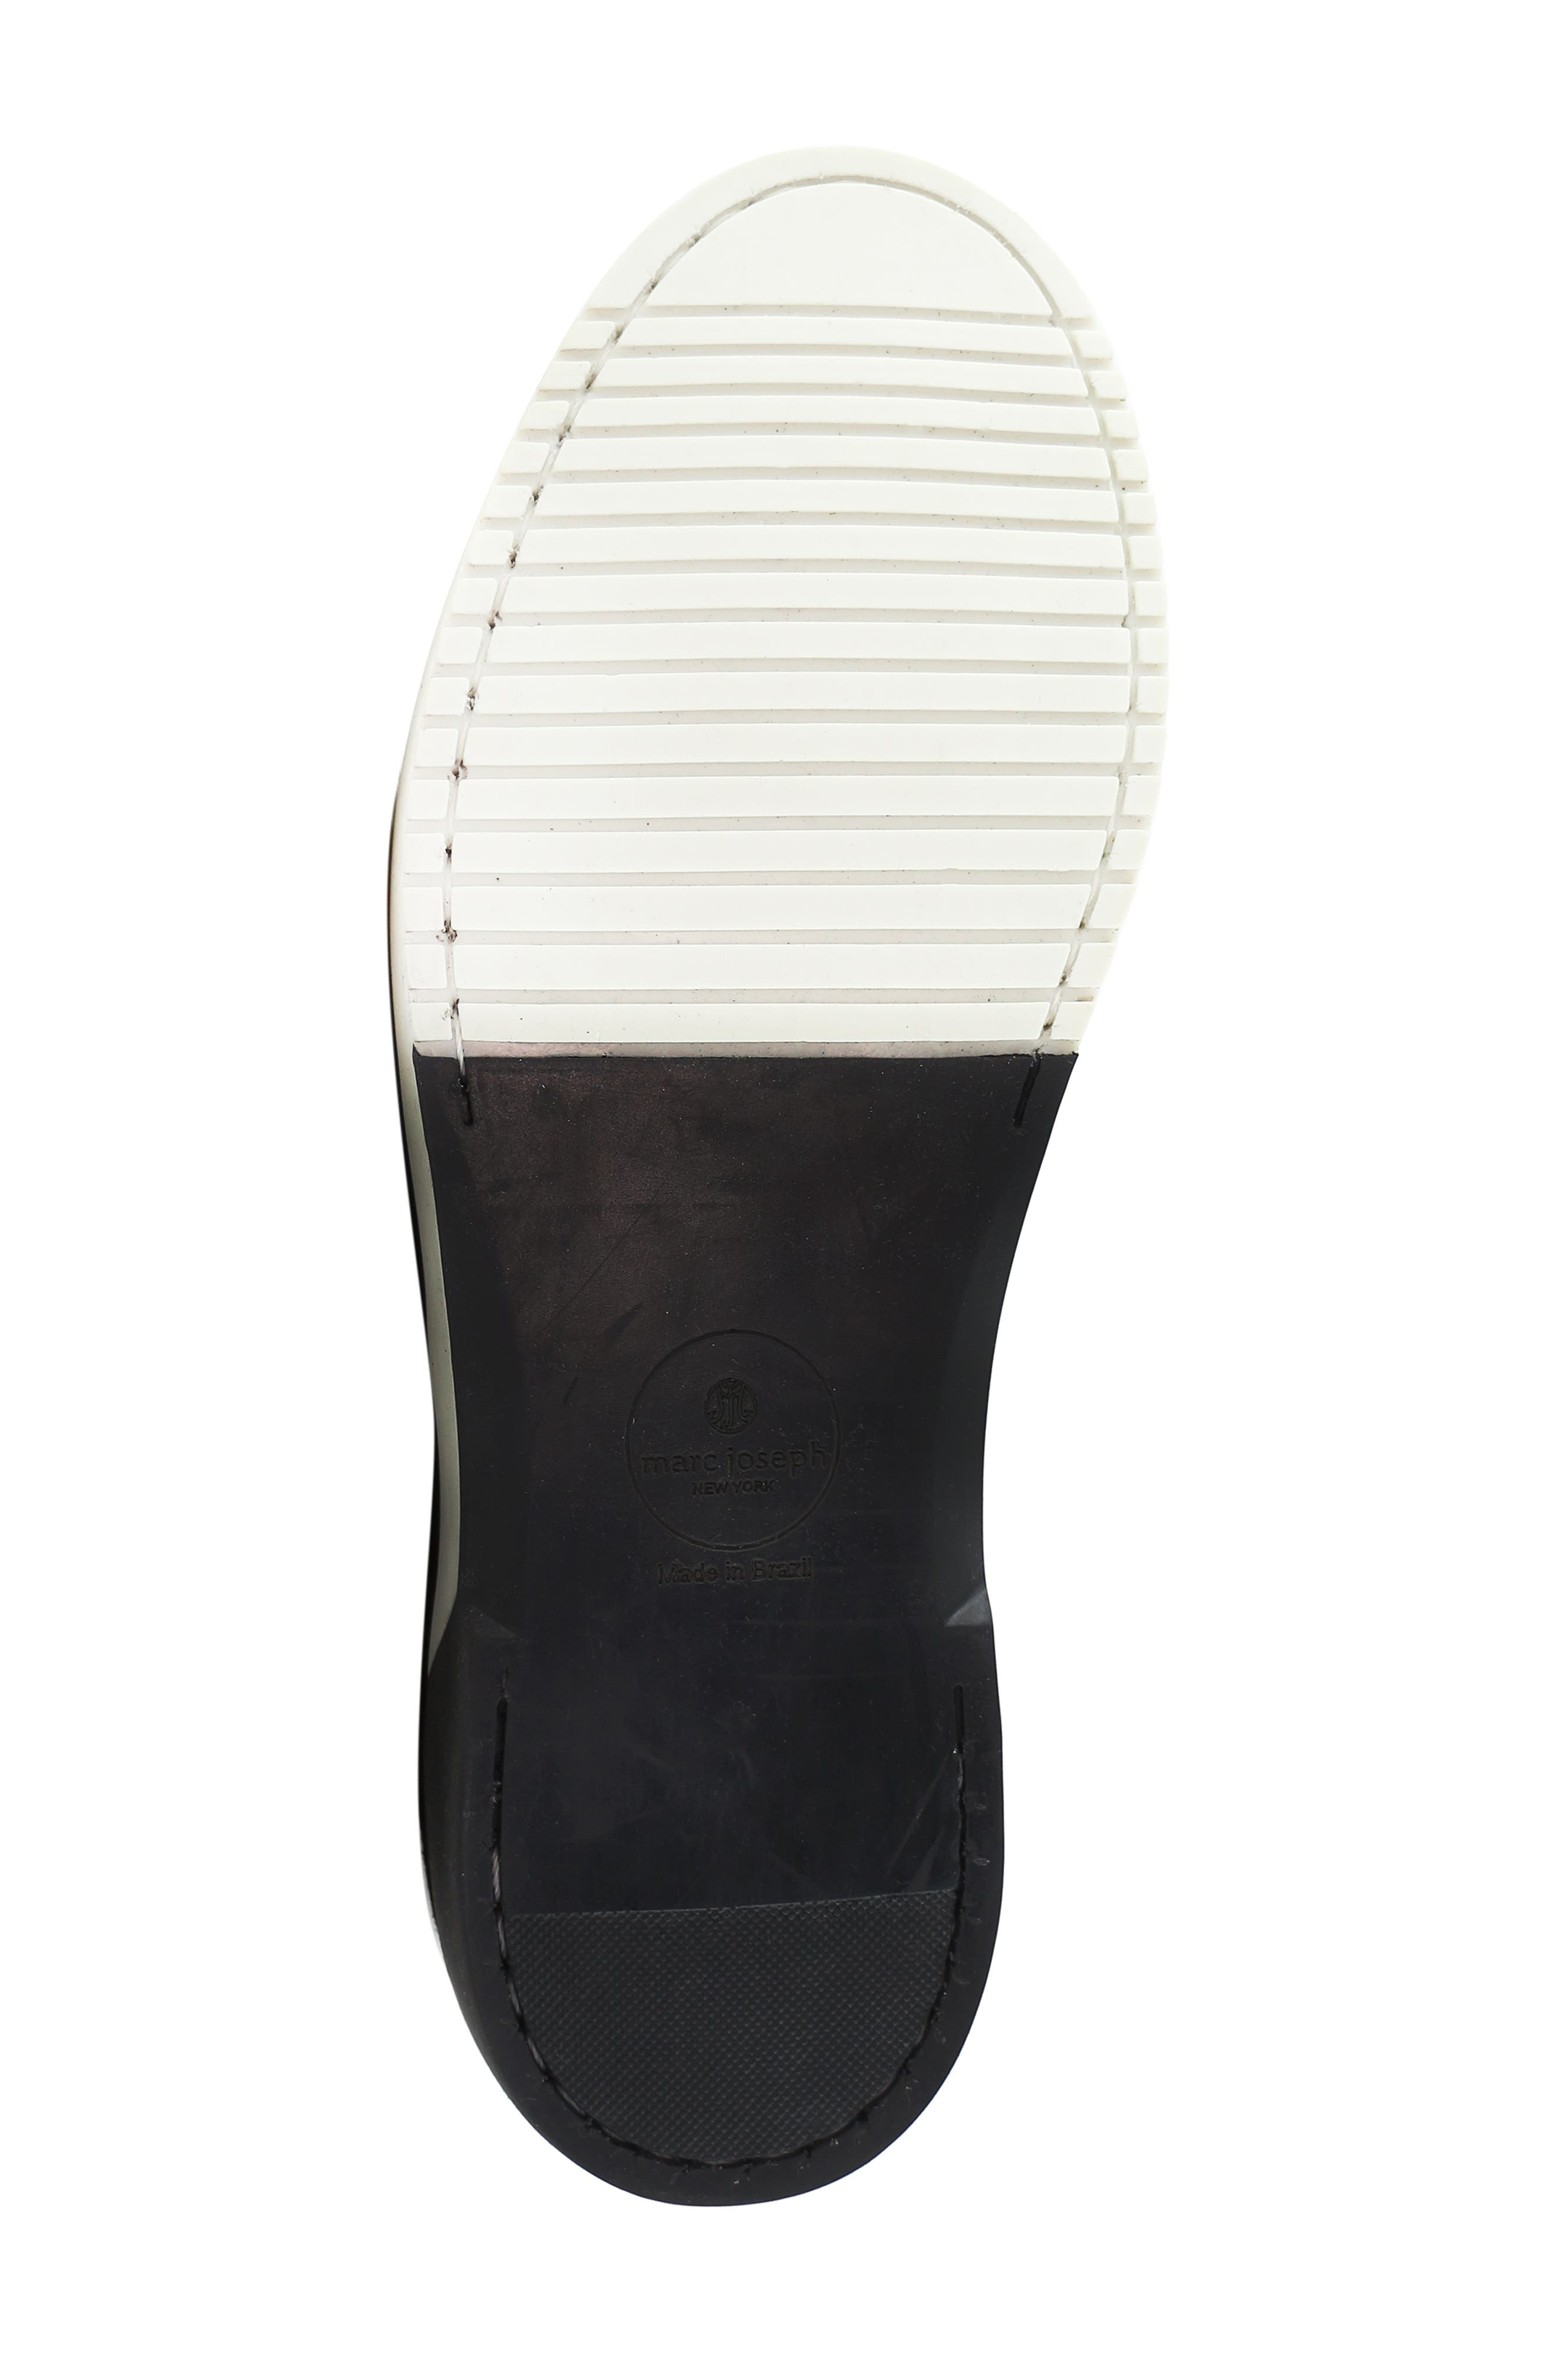 5th Ave Wingtip Sneaker,                             Alternate thumbnail 22, color,